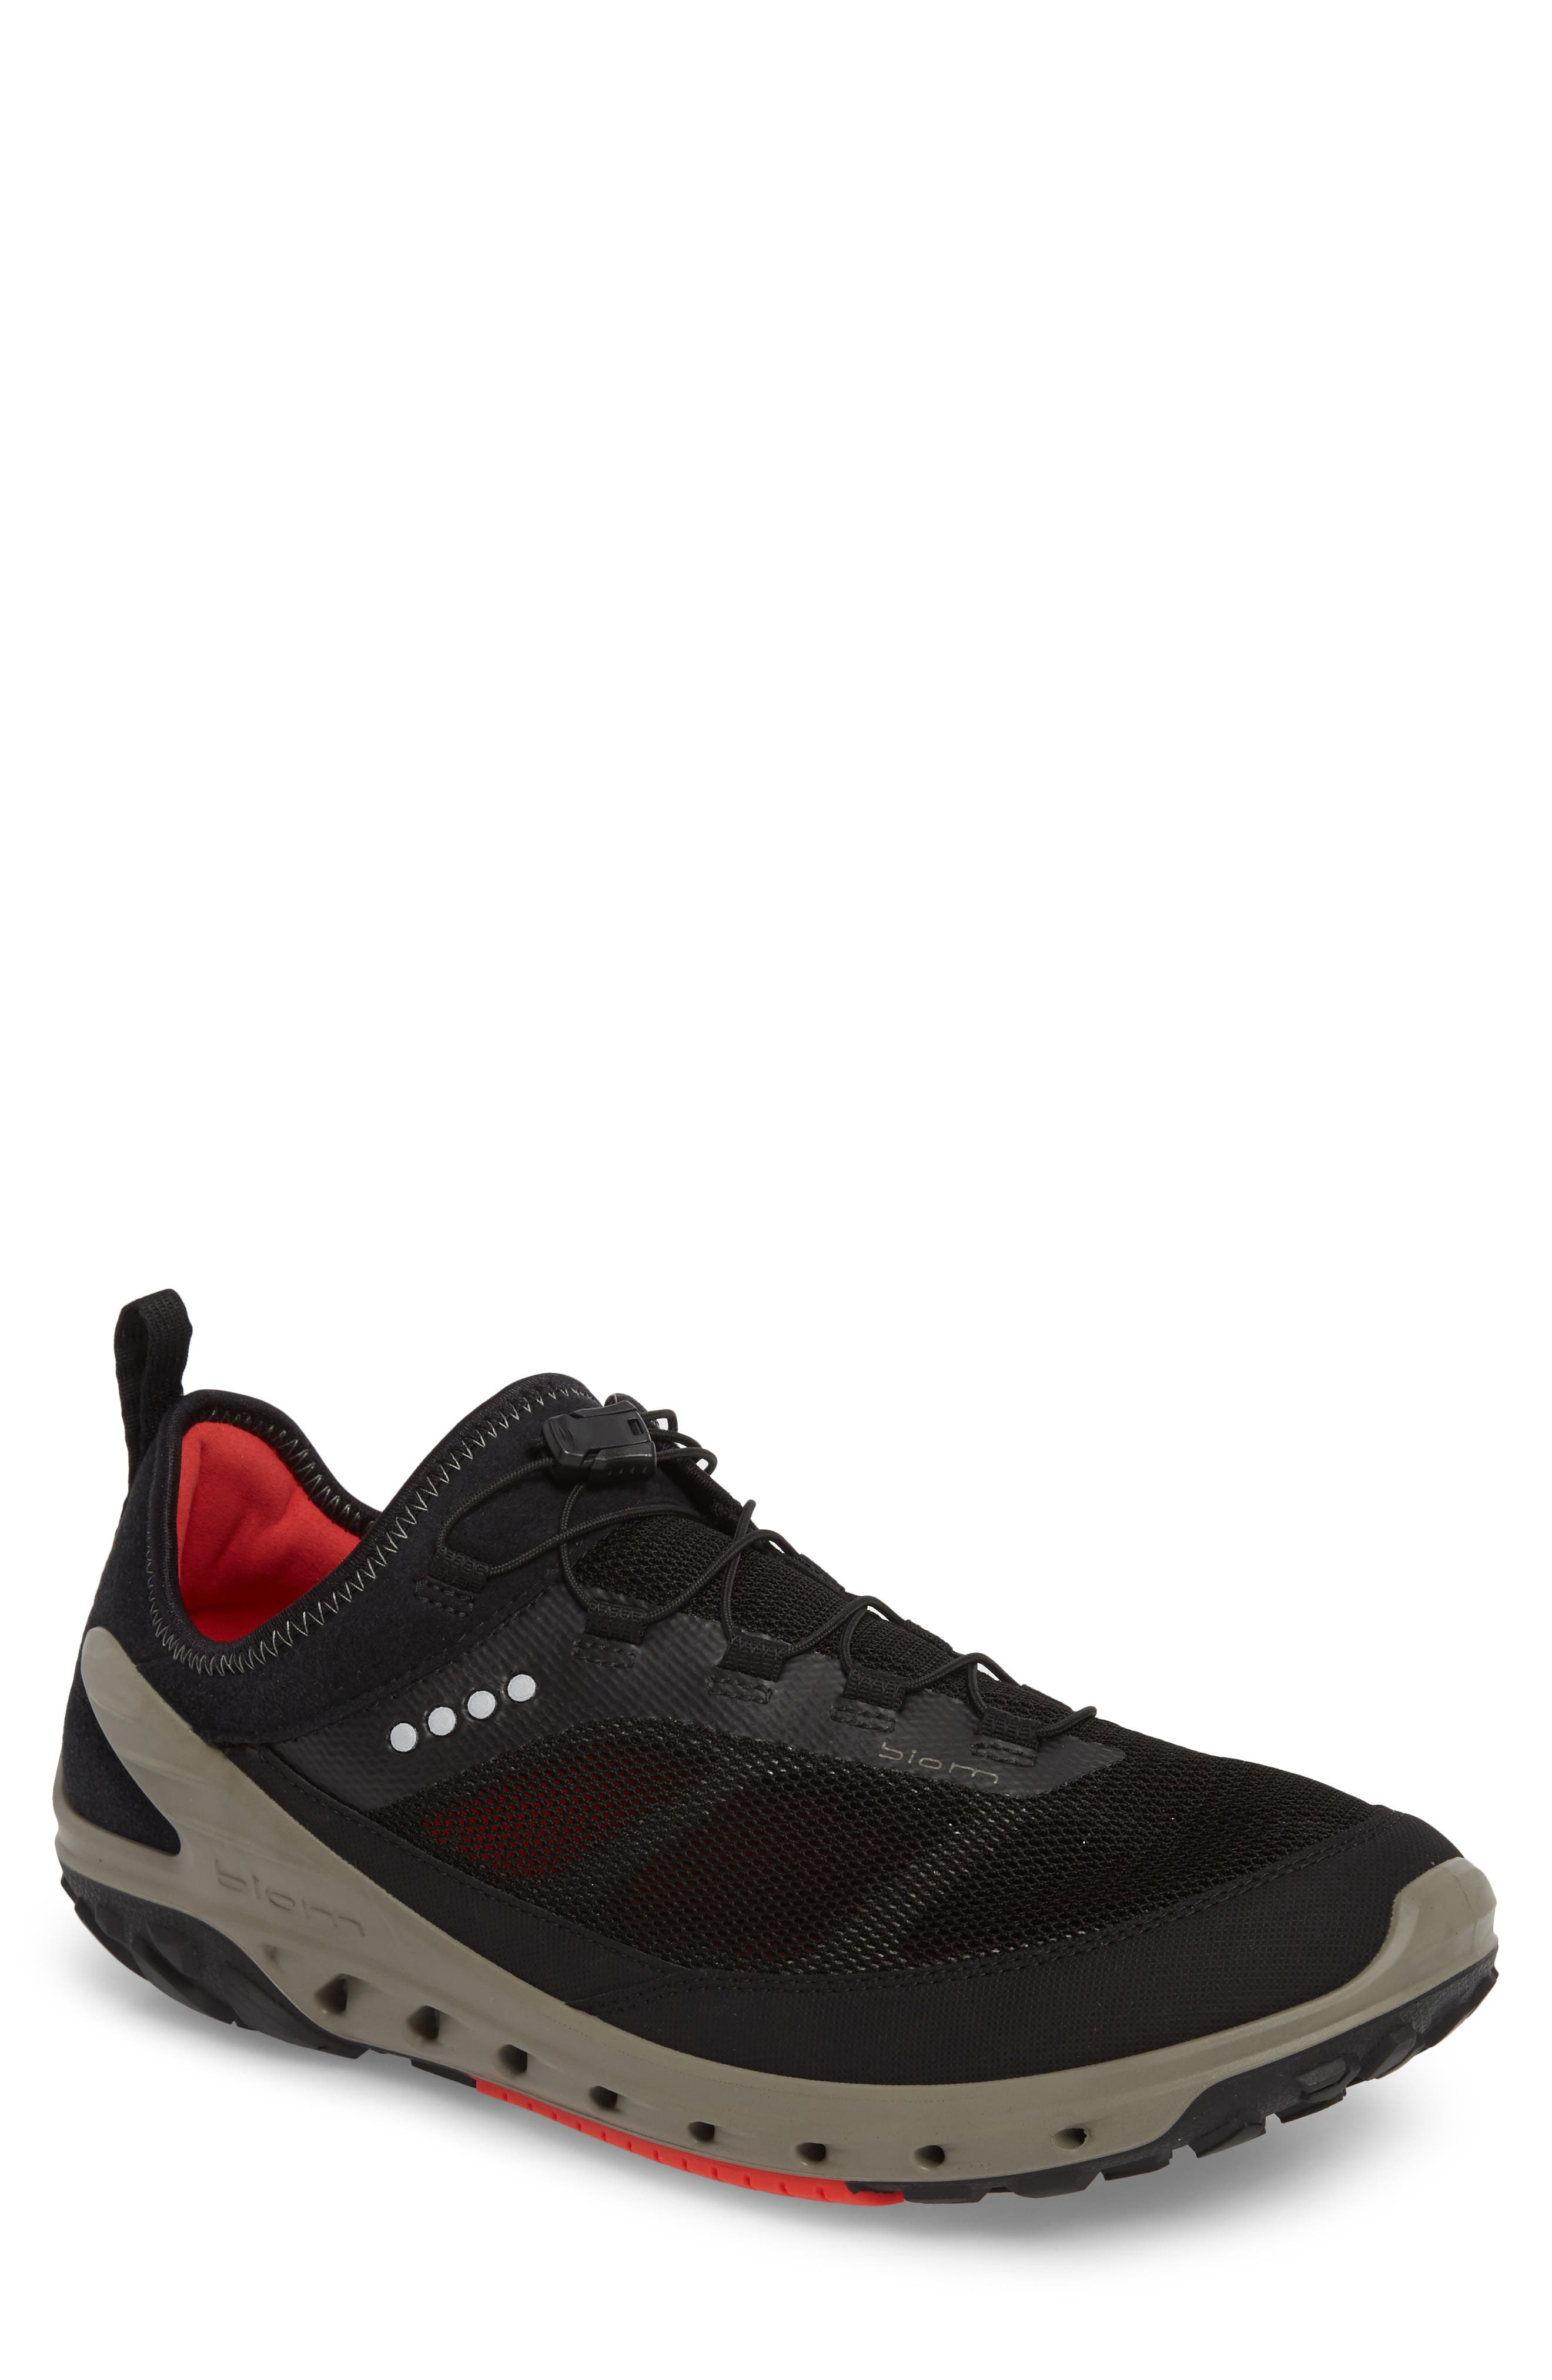 Biom Venture Sneaker,                         Main,                         color, Black Leather